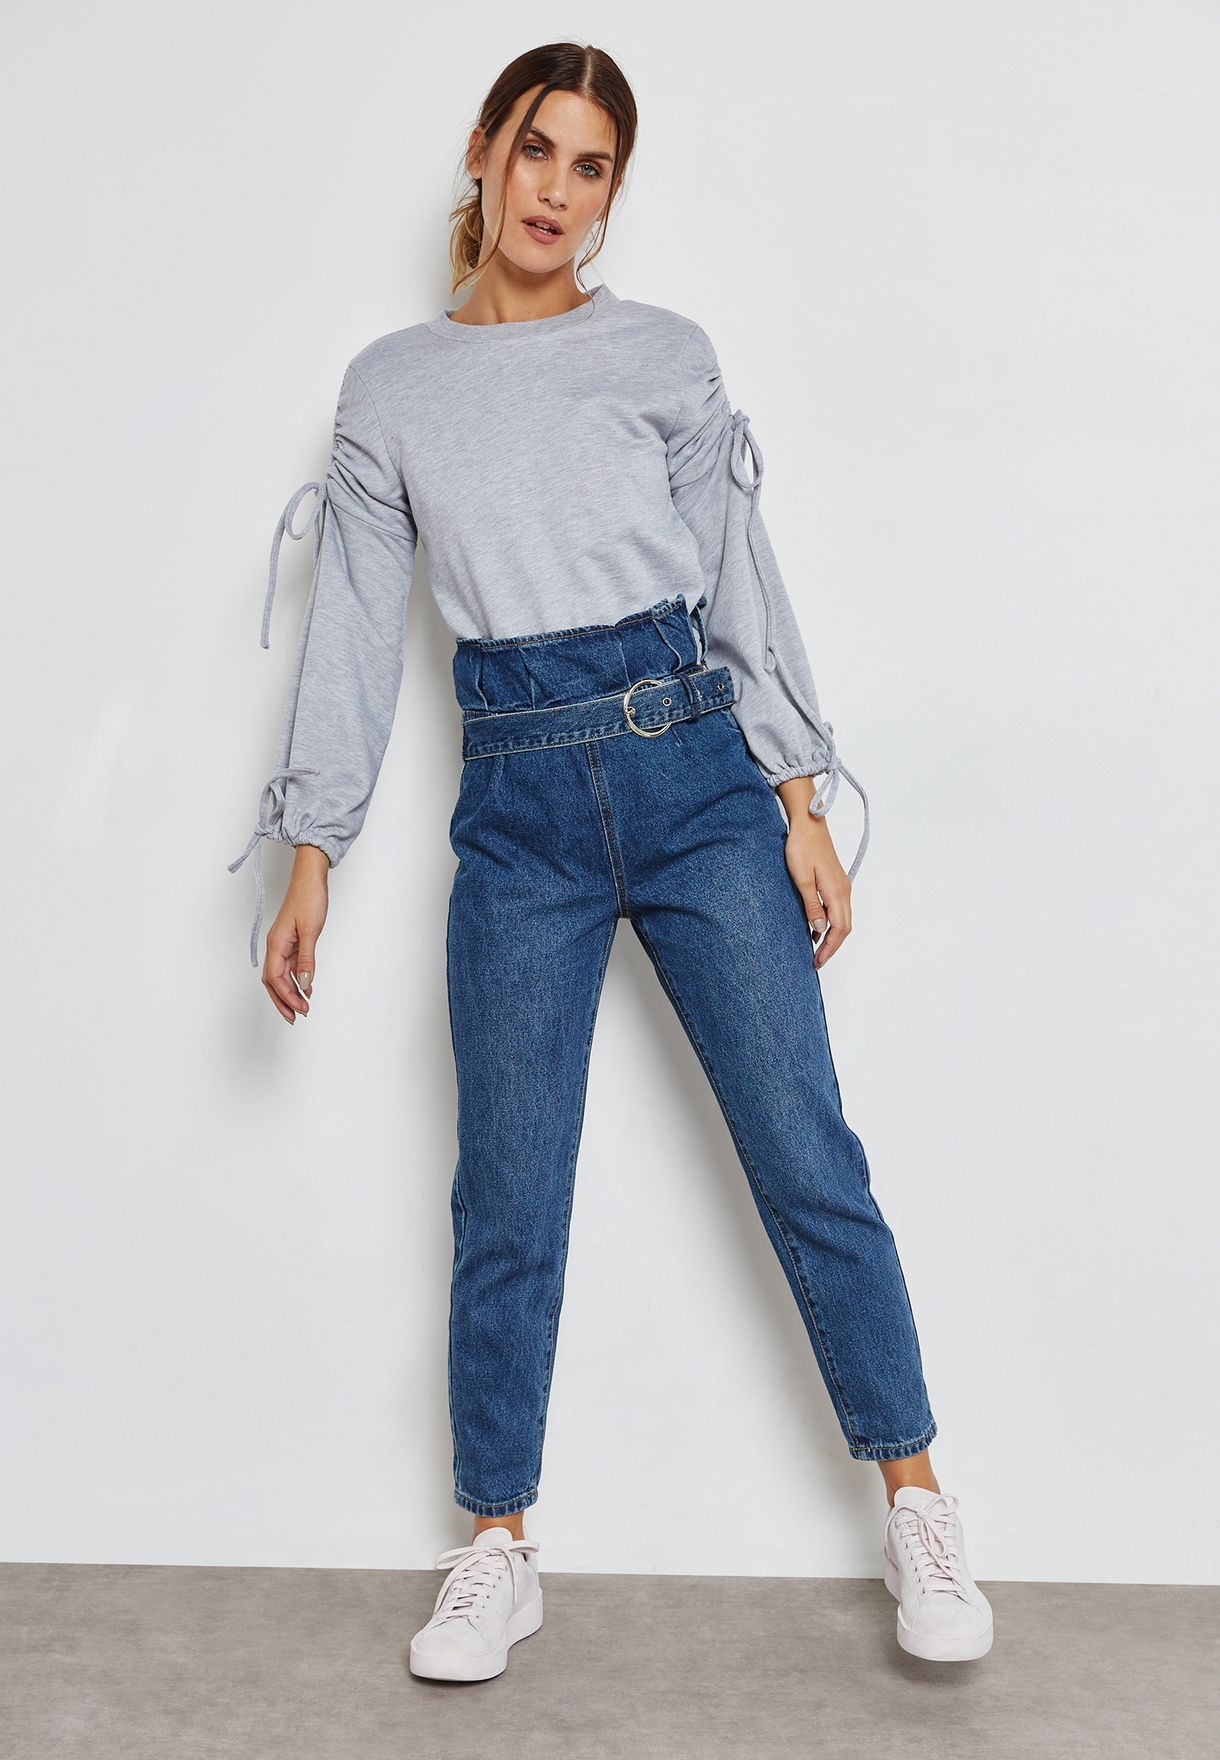 Lace Up Wide Sleeve Sweatshirt